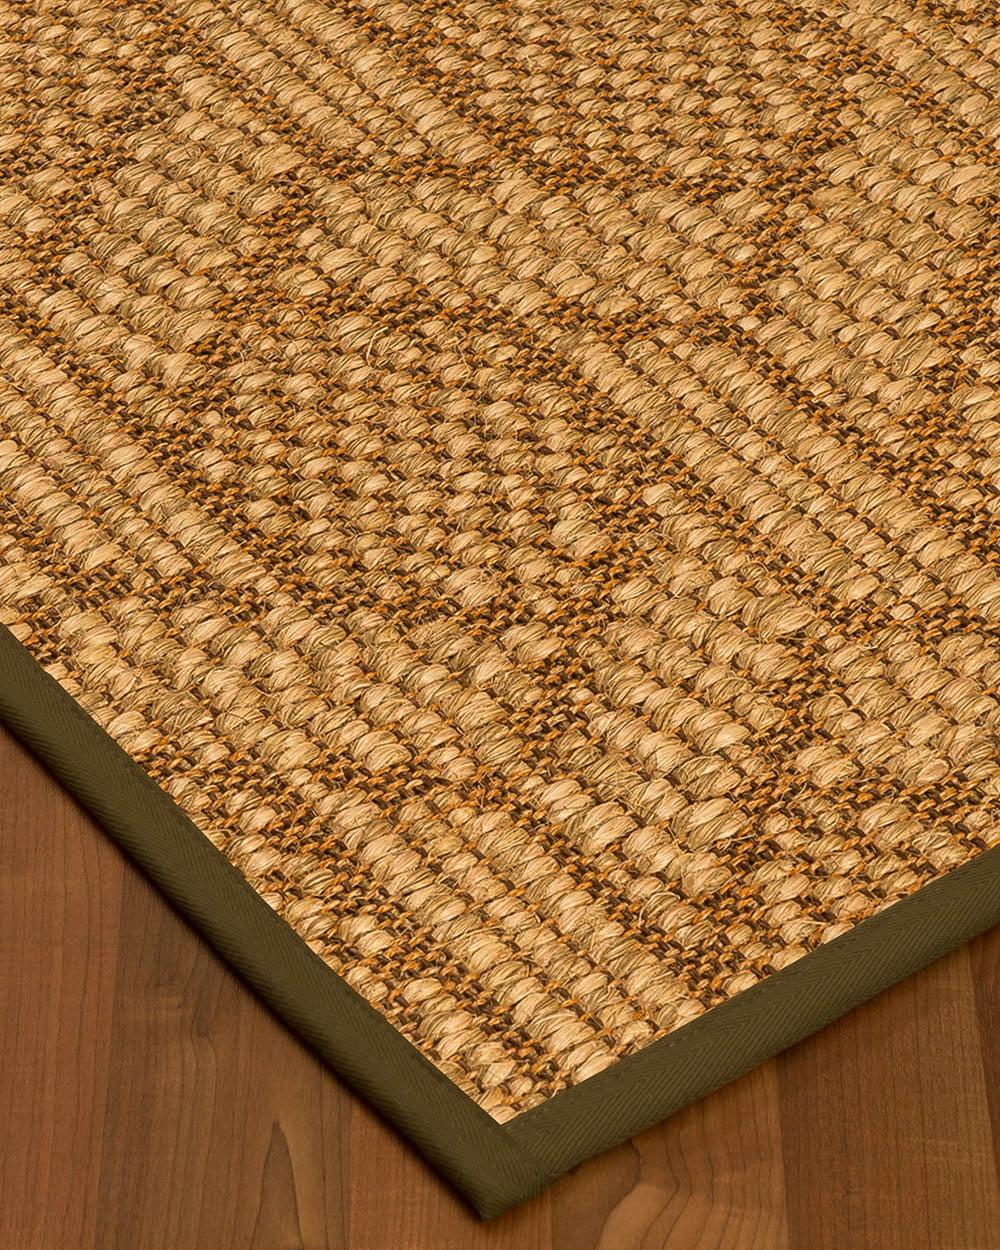 Naturalarearugs Seattle Sisal Area Rug Handmade In Usa